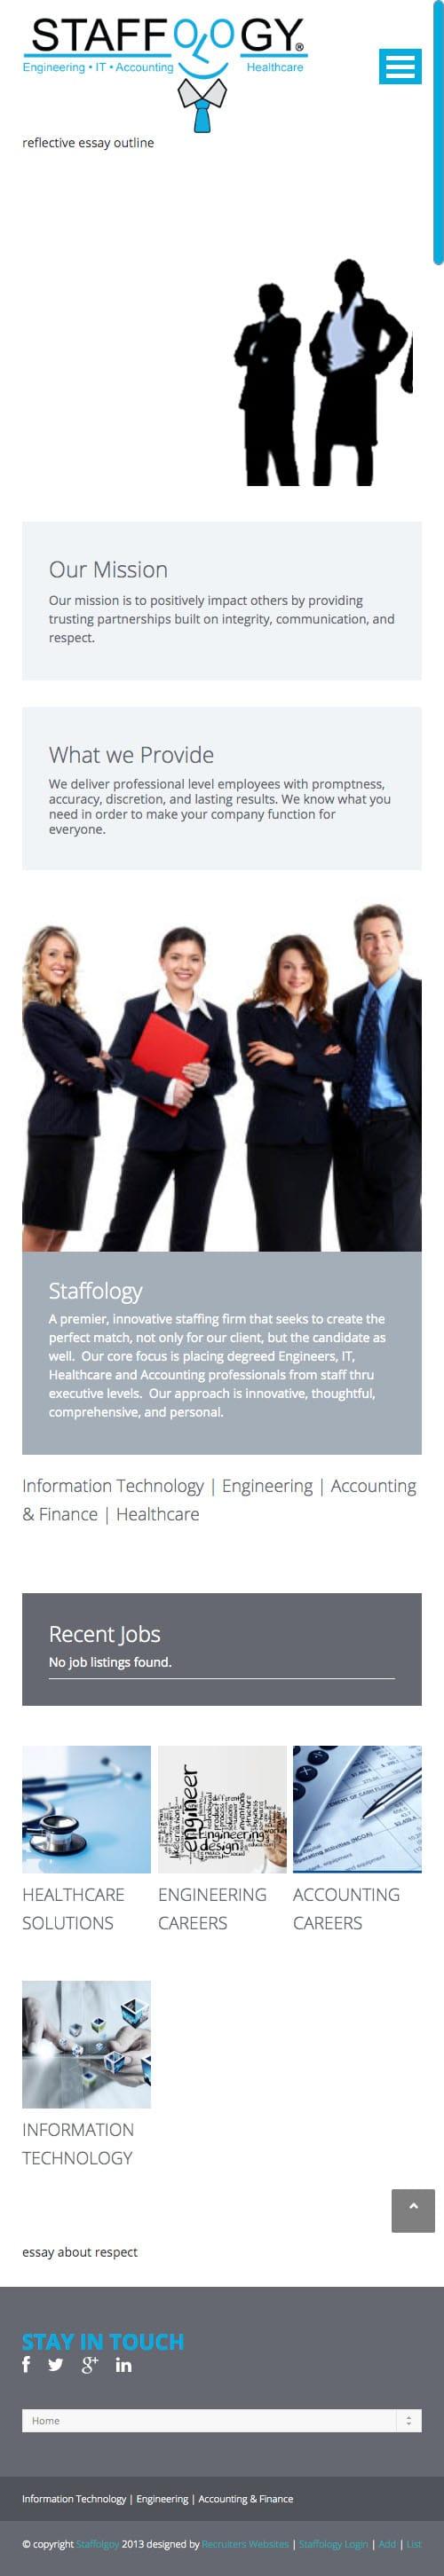 Staffology